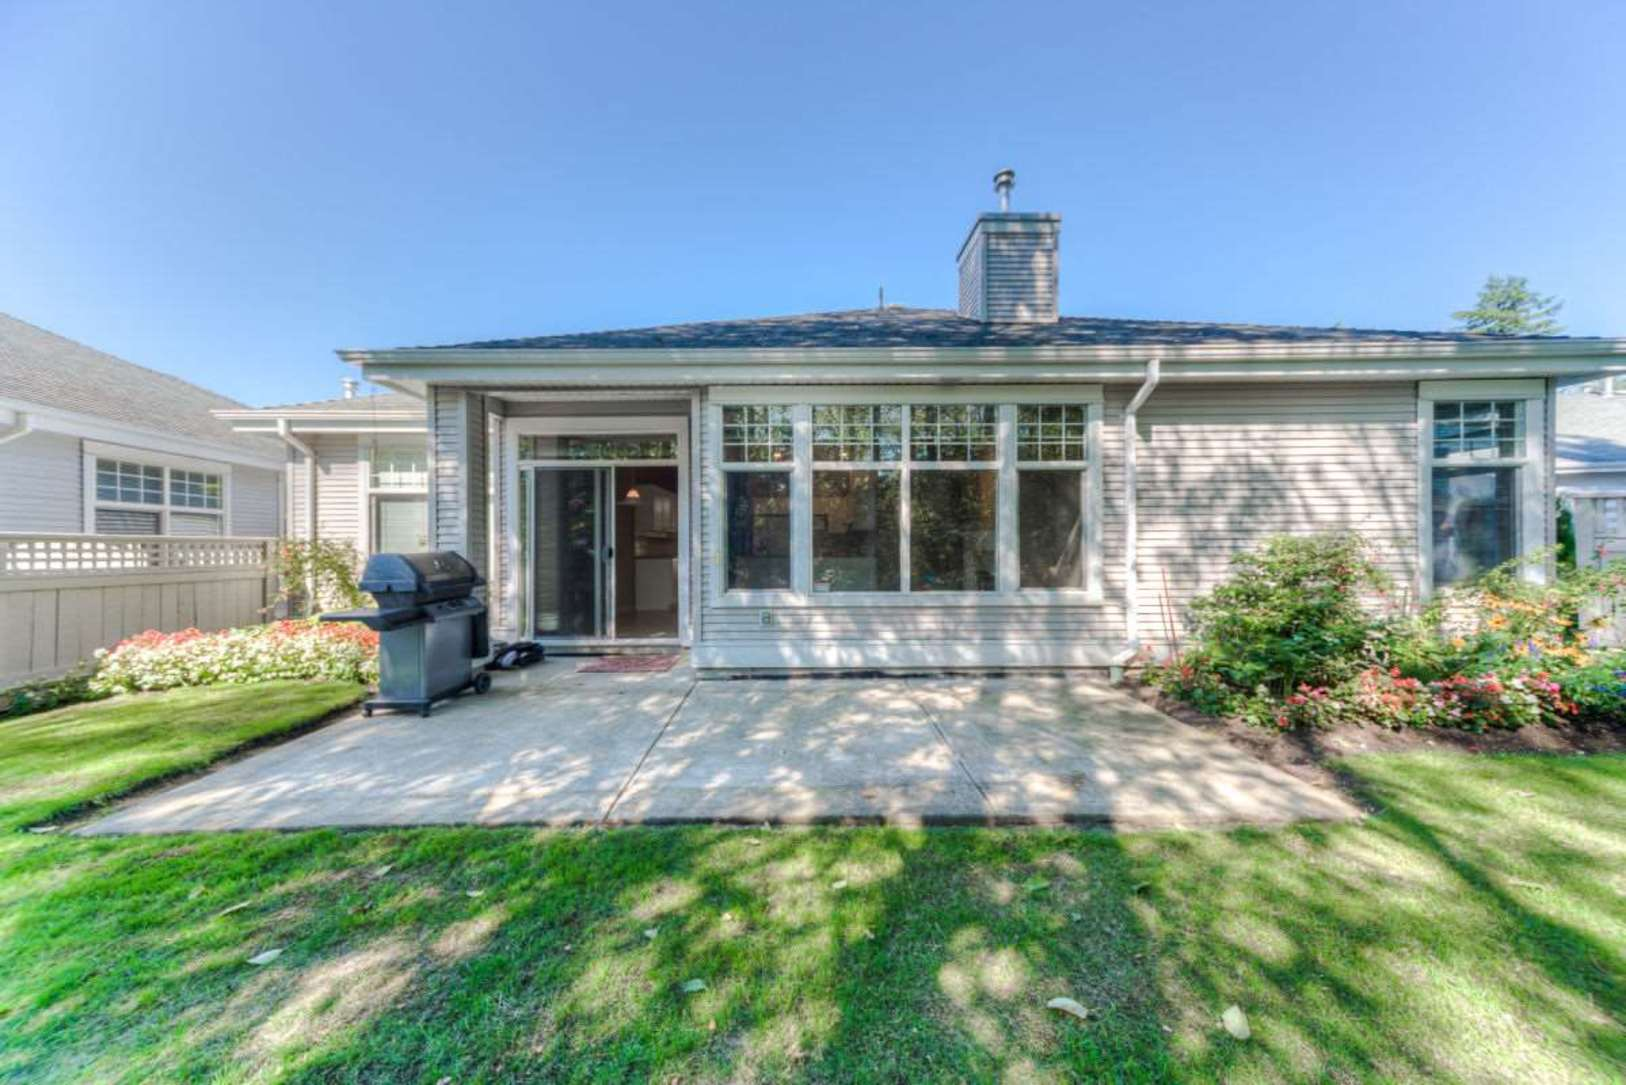 Exterior house at 19 - 20770 97b Avenue, Walnut Grove, Langley